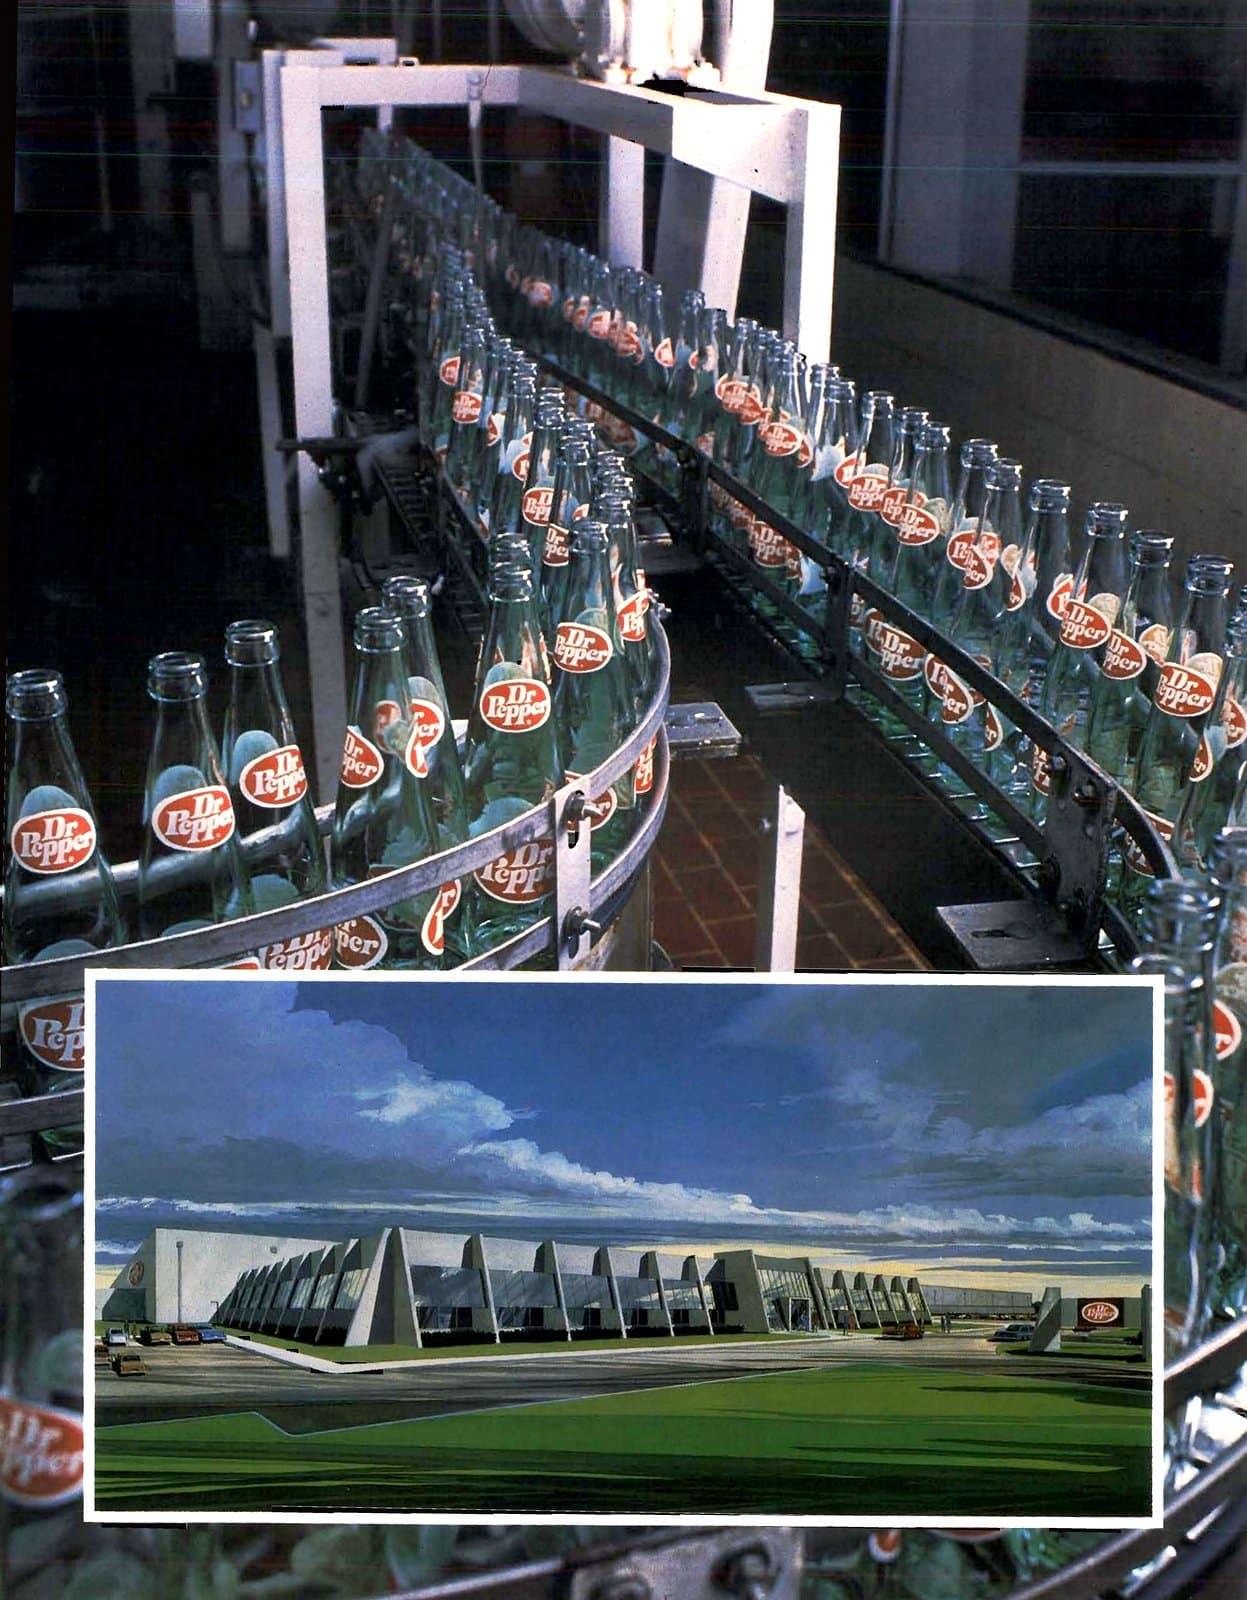 Dr Pepper bottles on production line in factory (1976)